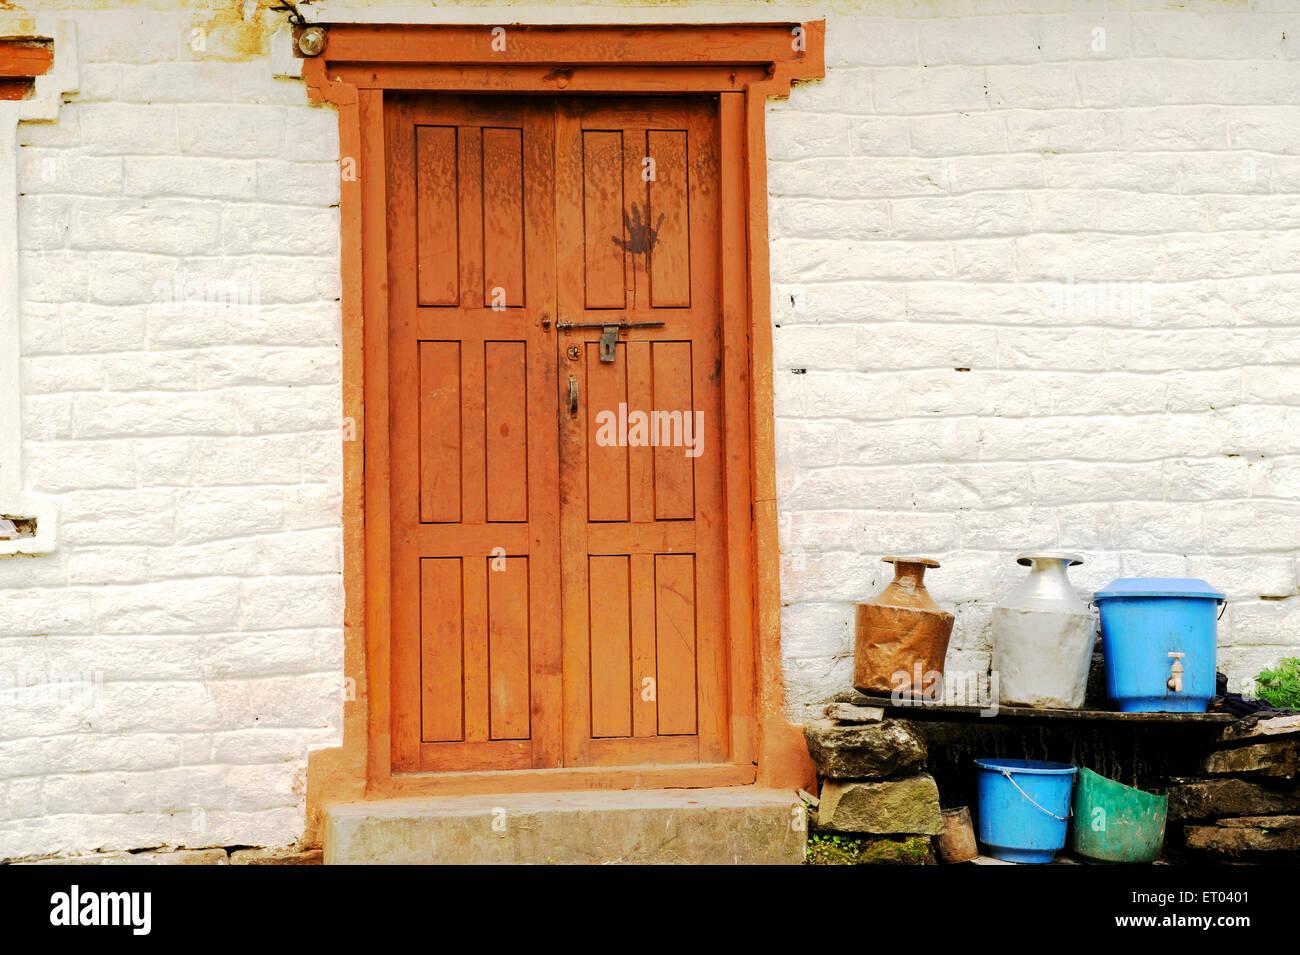 Utensil at wooden door ; Kopchepani ; Nepal - Stock Image